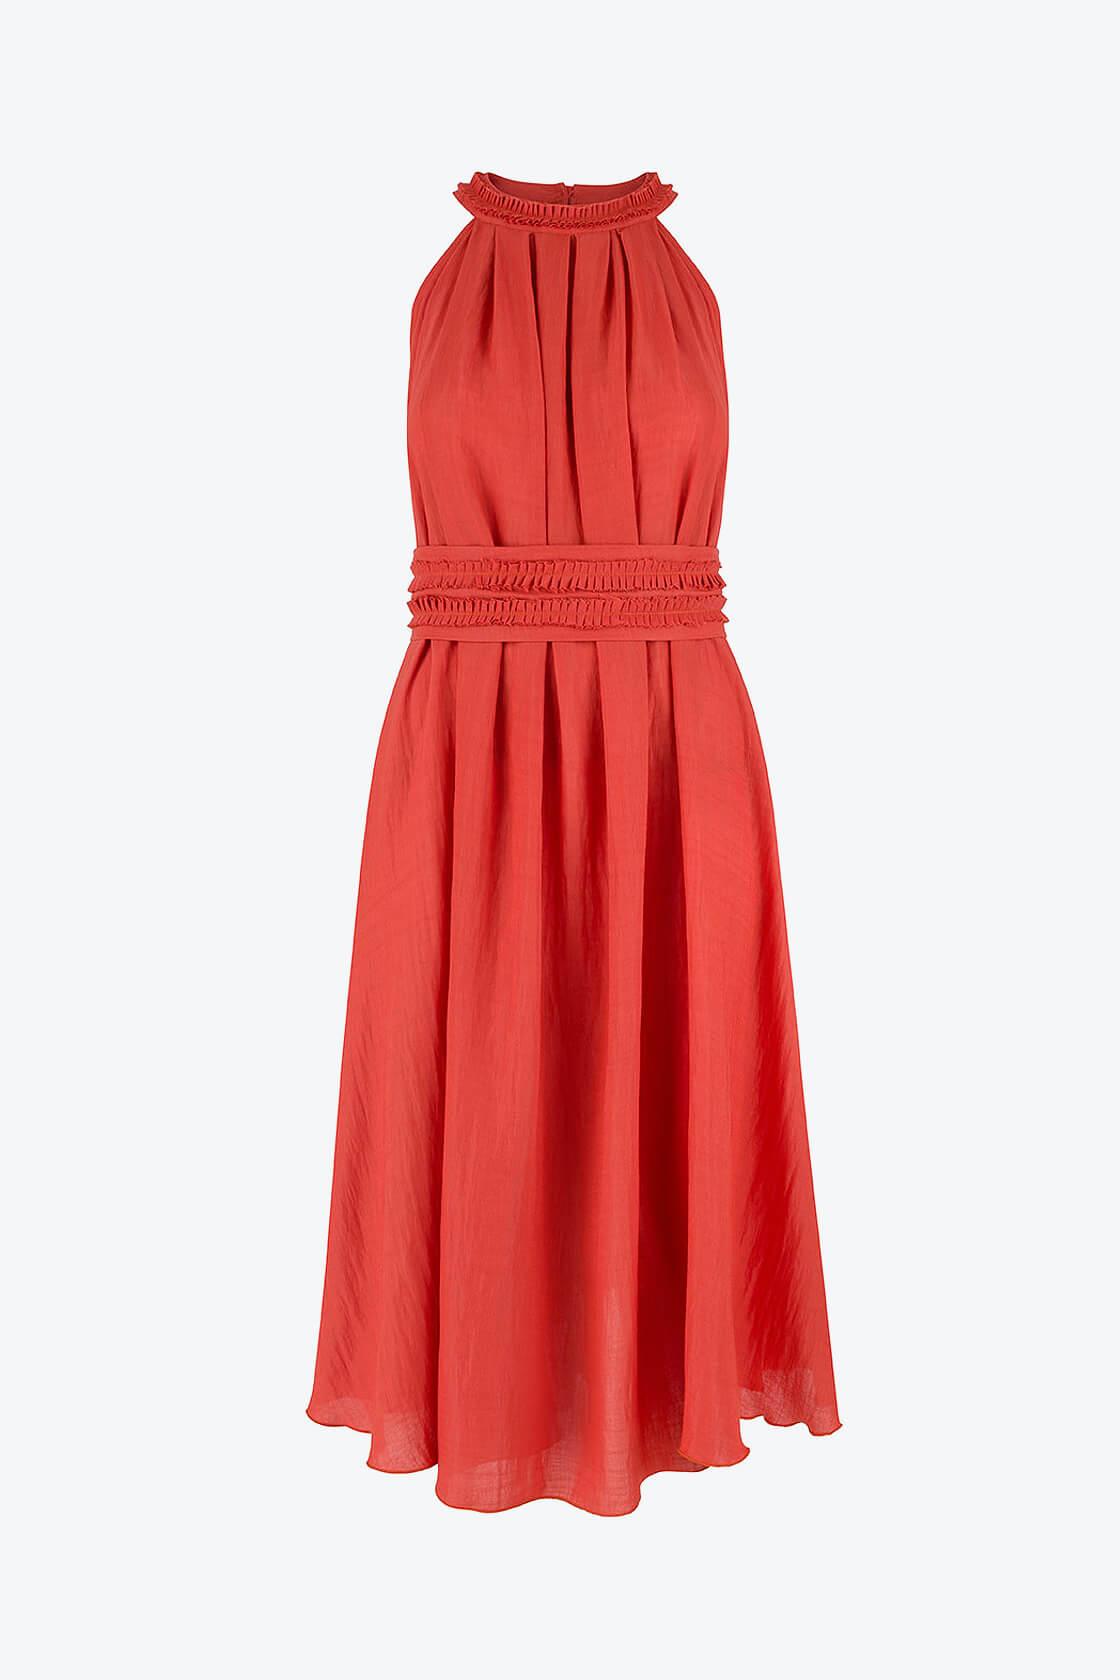 OL100002652 Olivera Sleeveless Cocktail Dress Red1